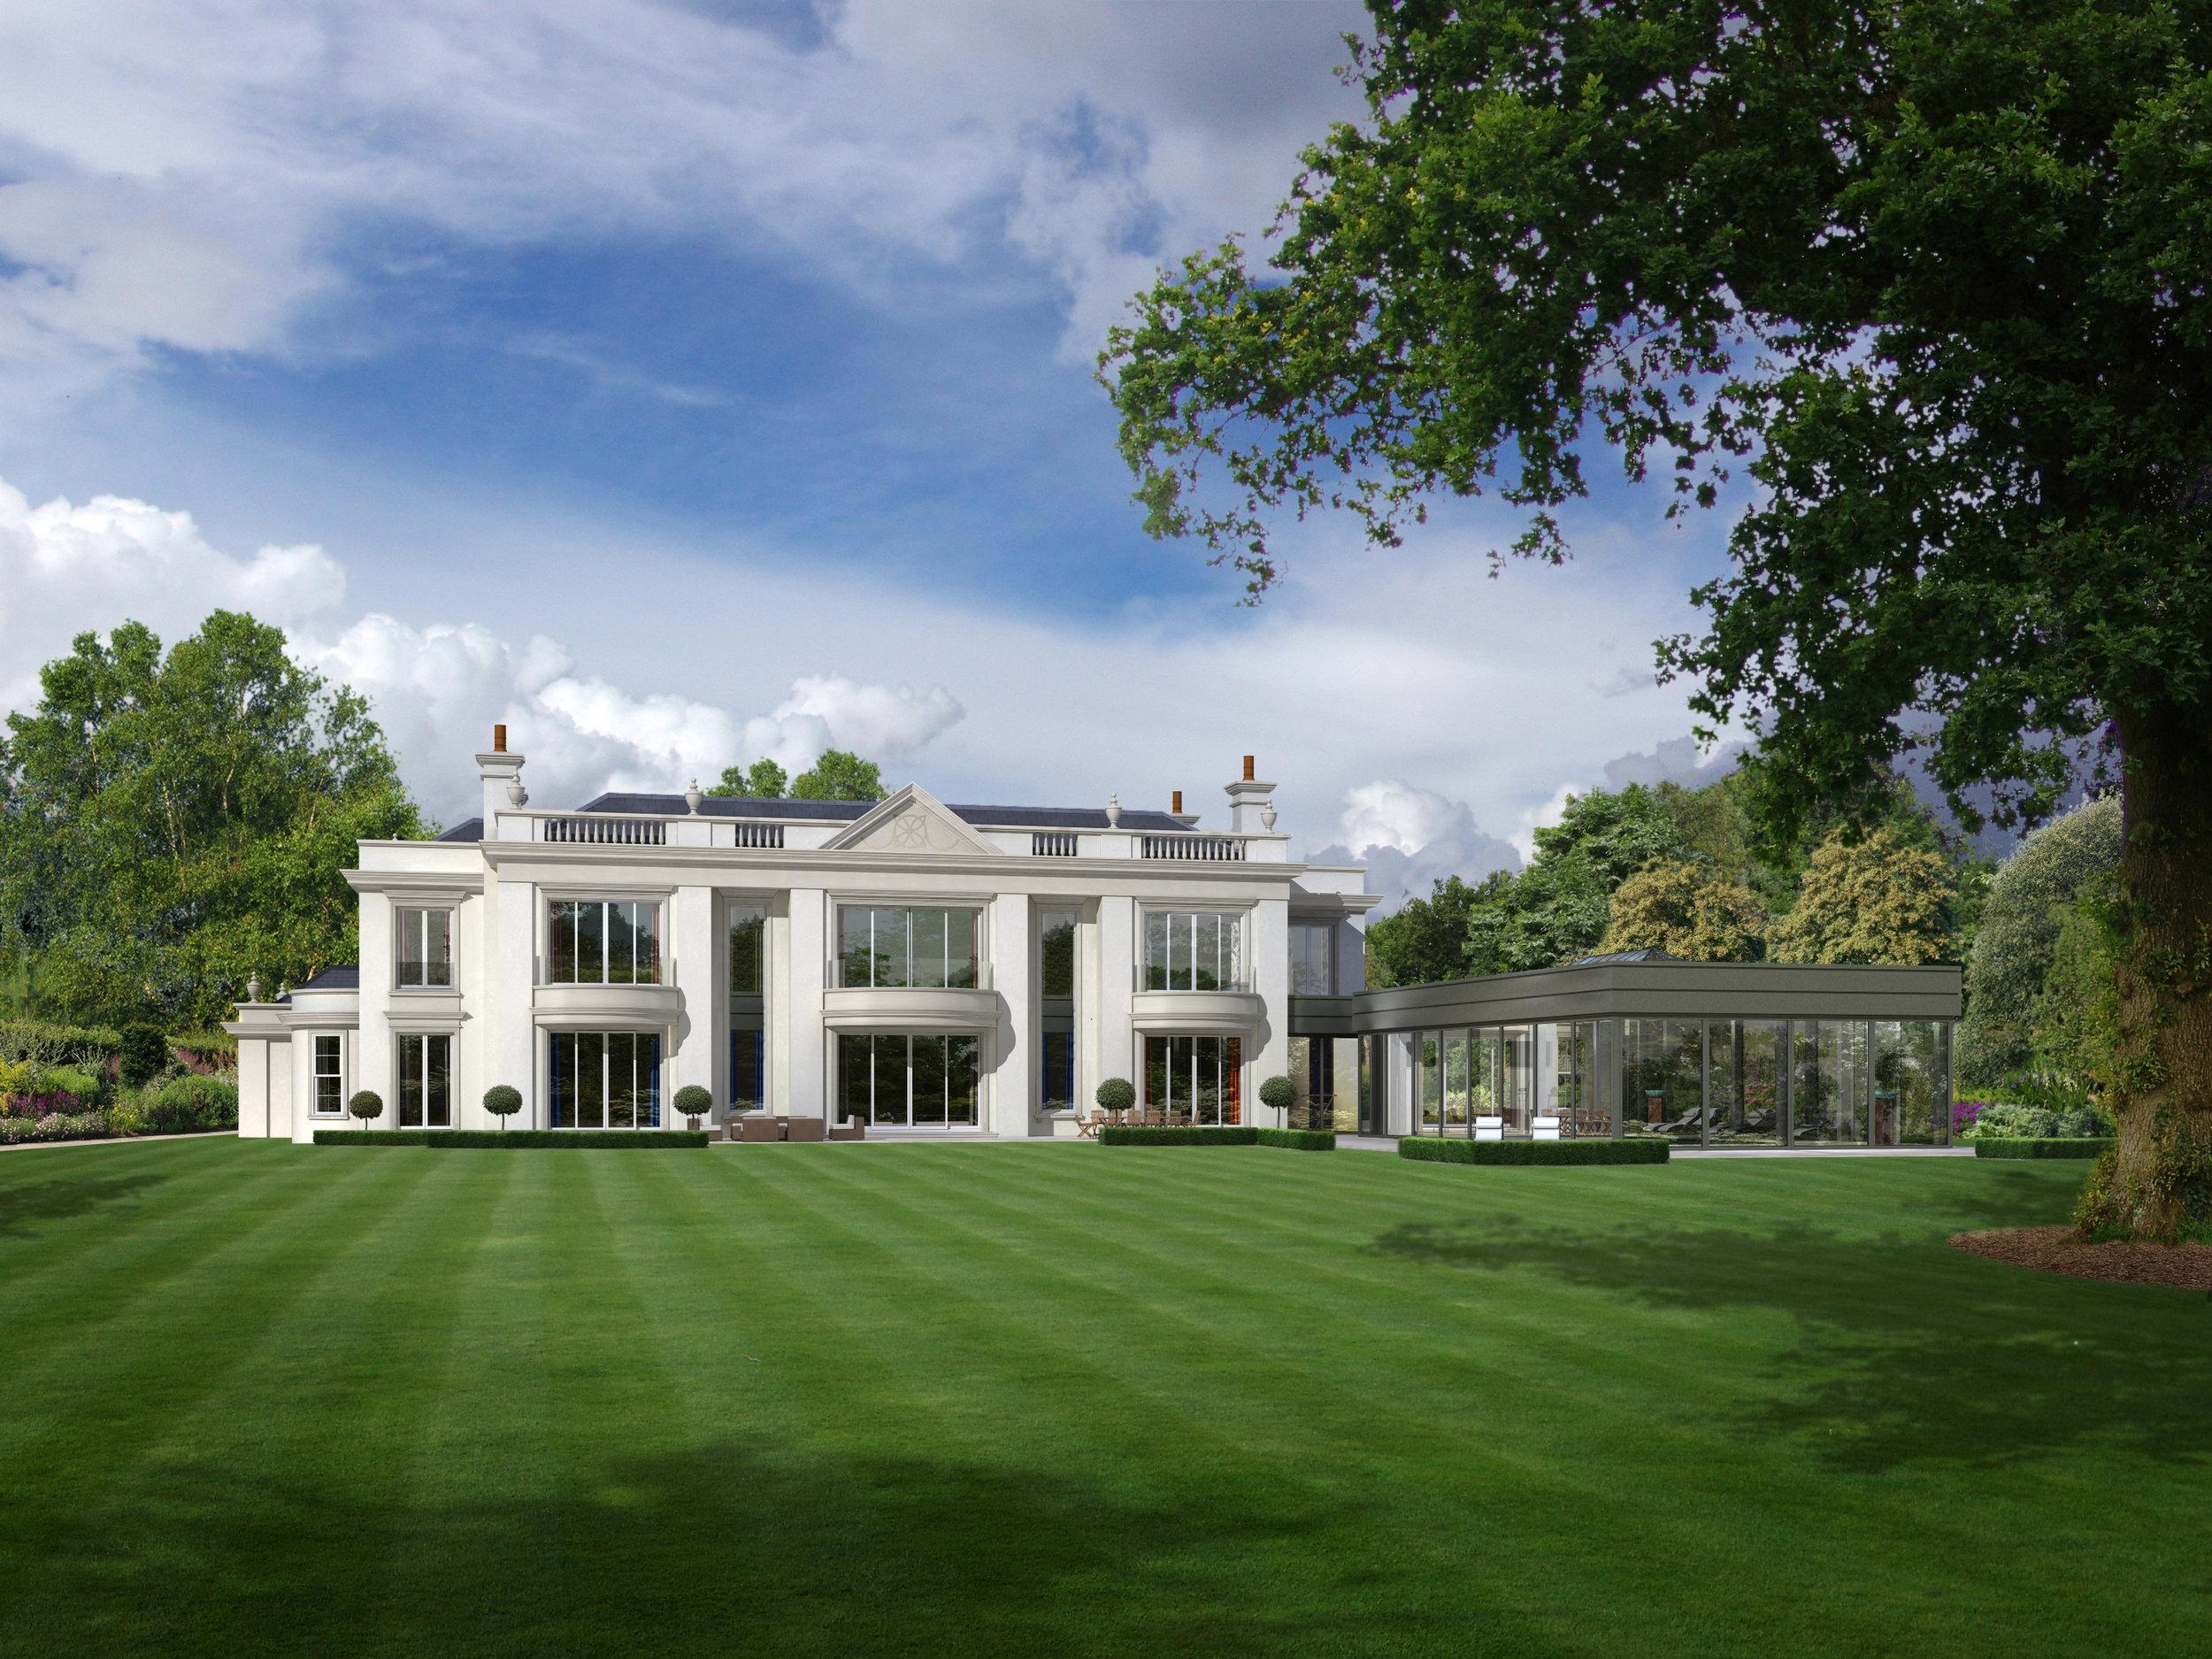 millwood house(2).jpg